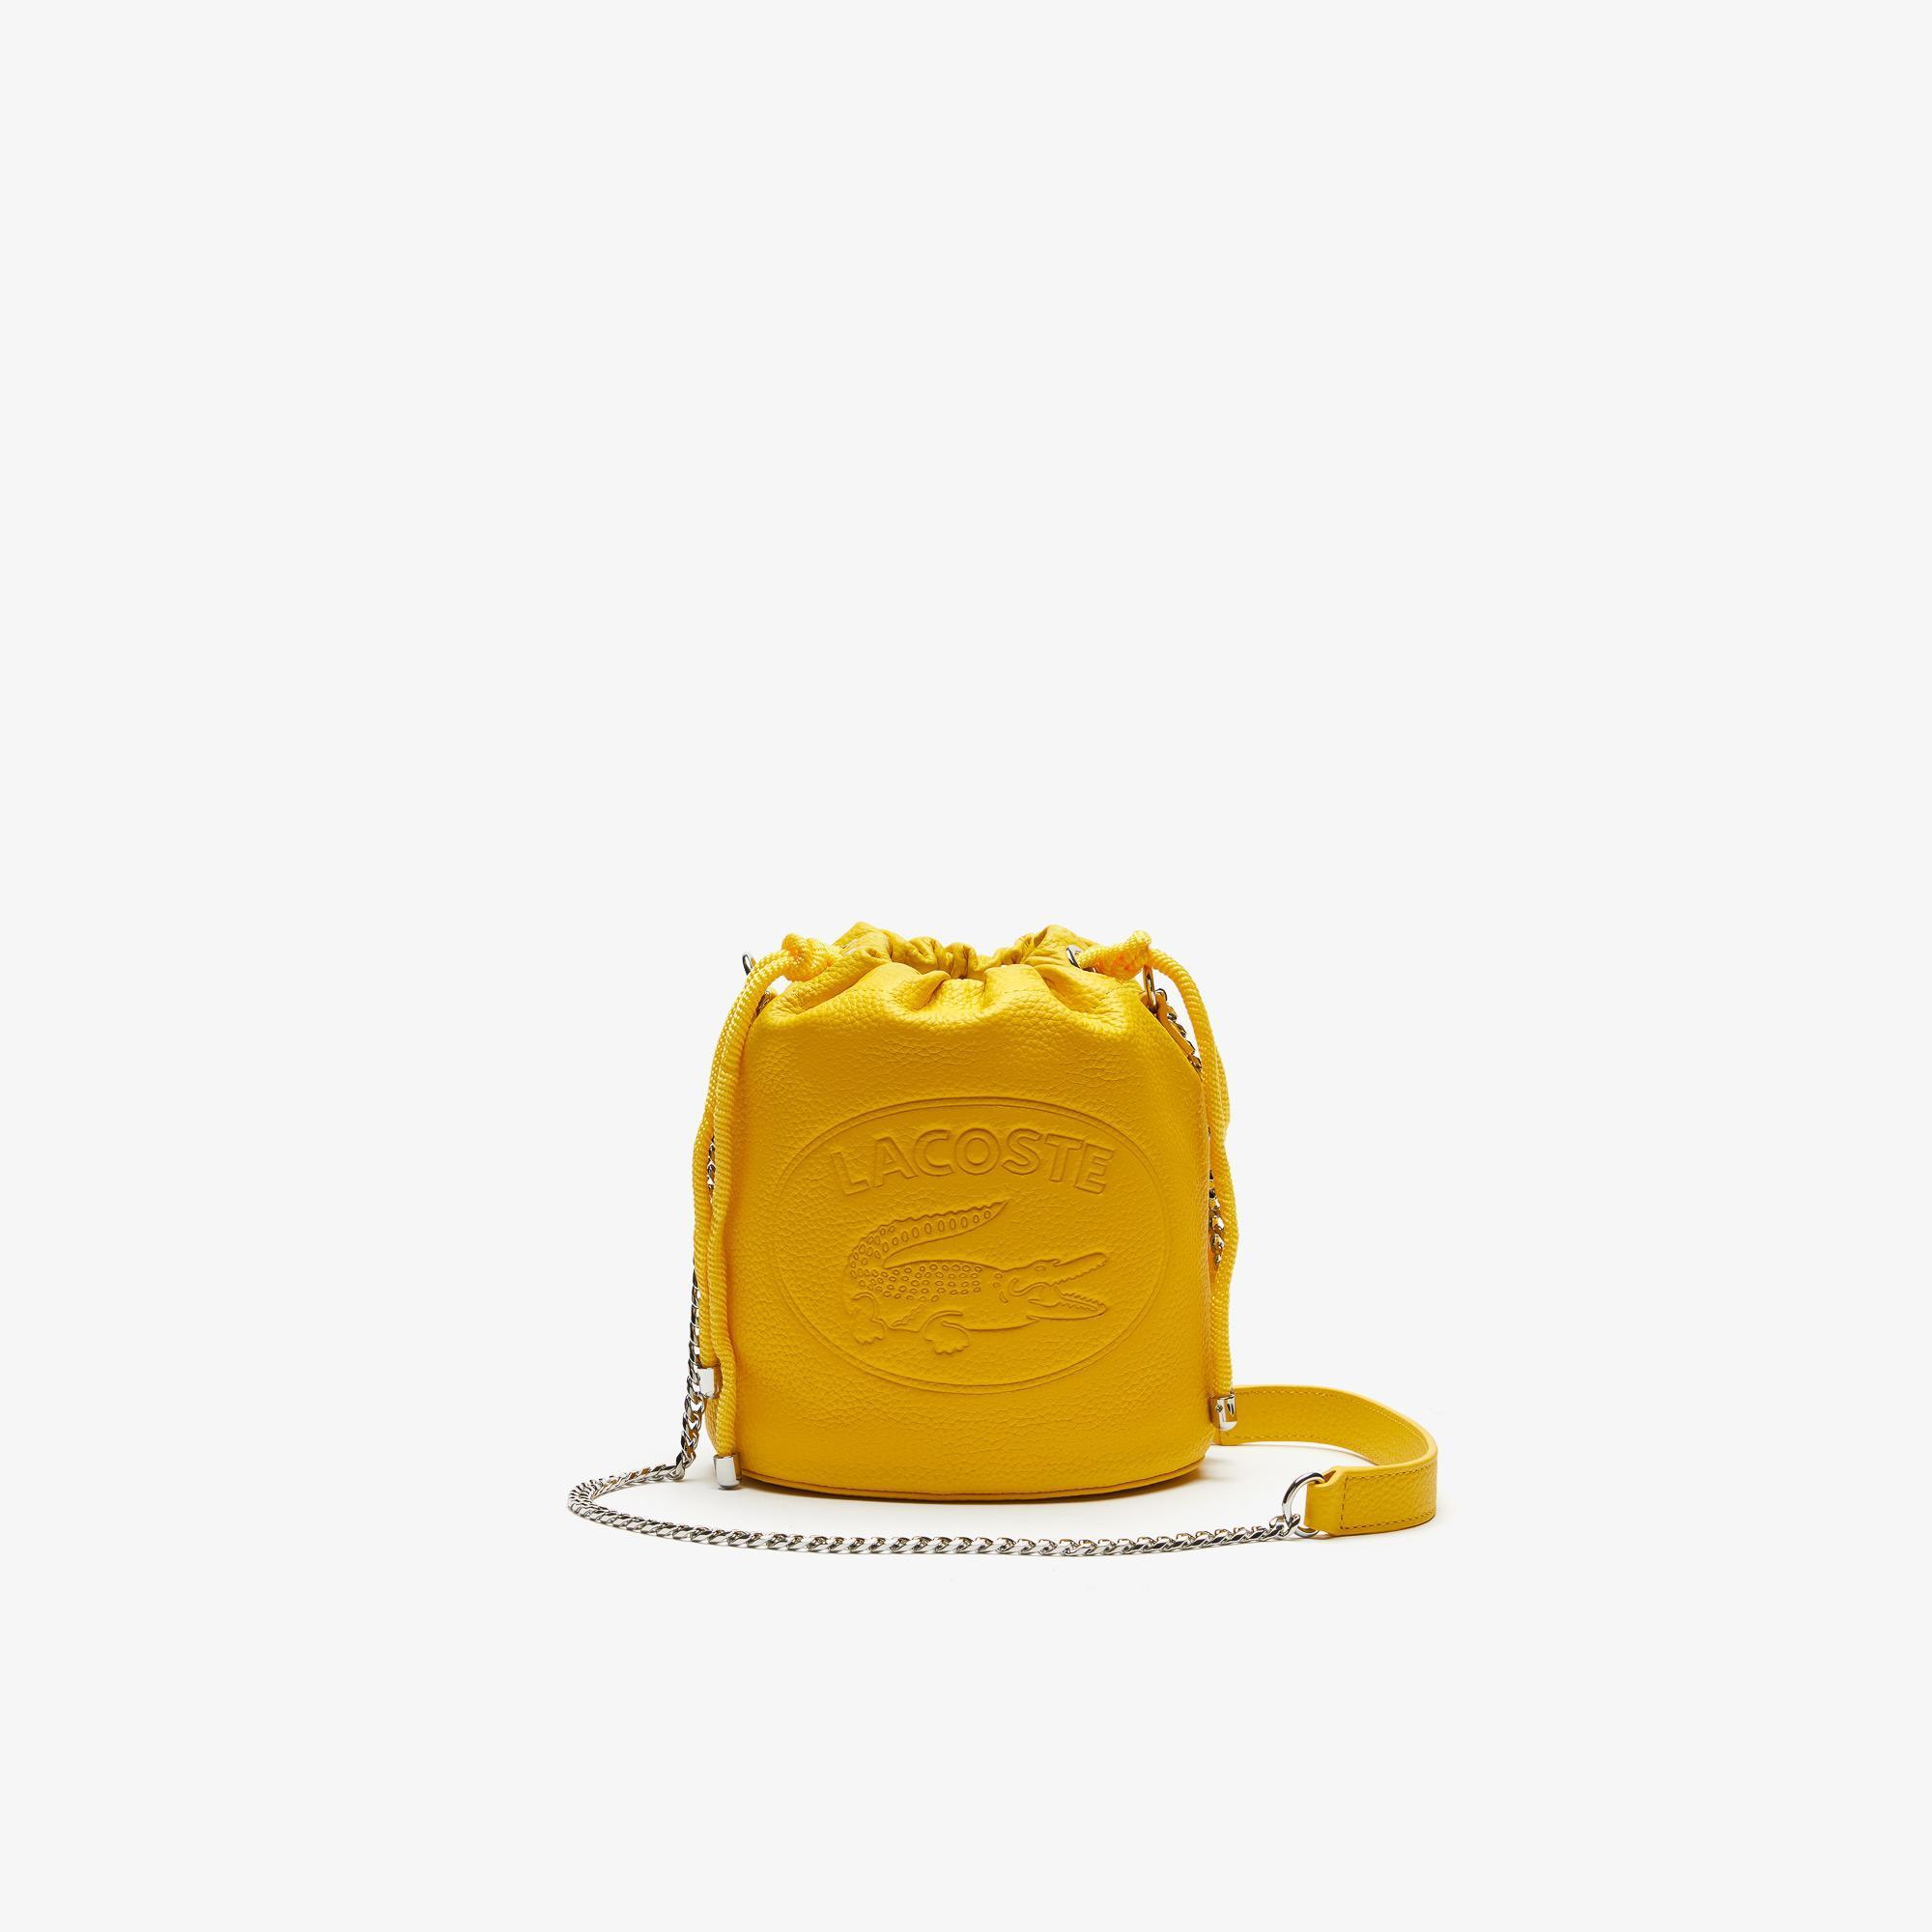 Lacoste Women's Croco Crew Grained Leather Bucket Bag